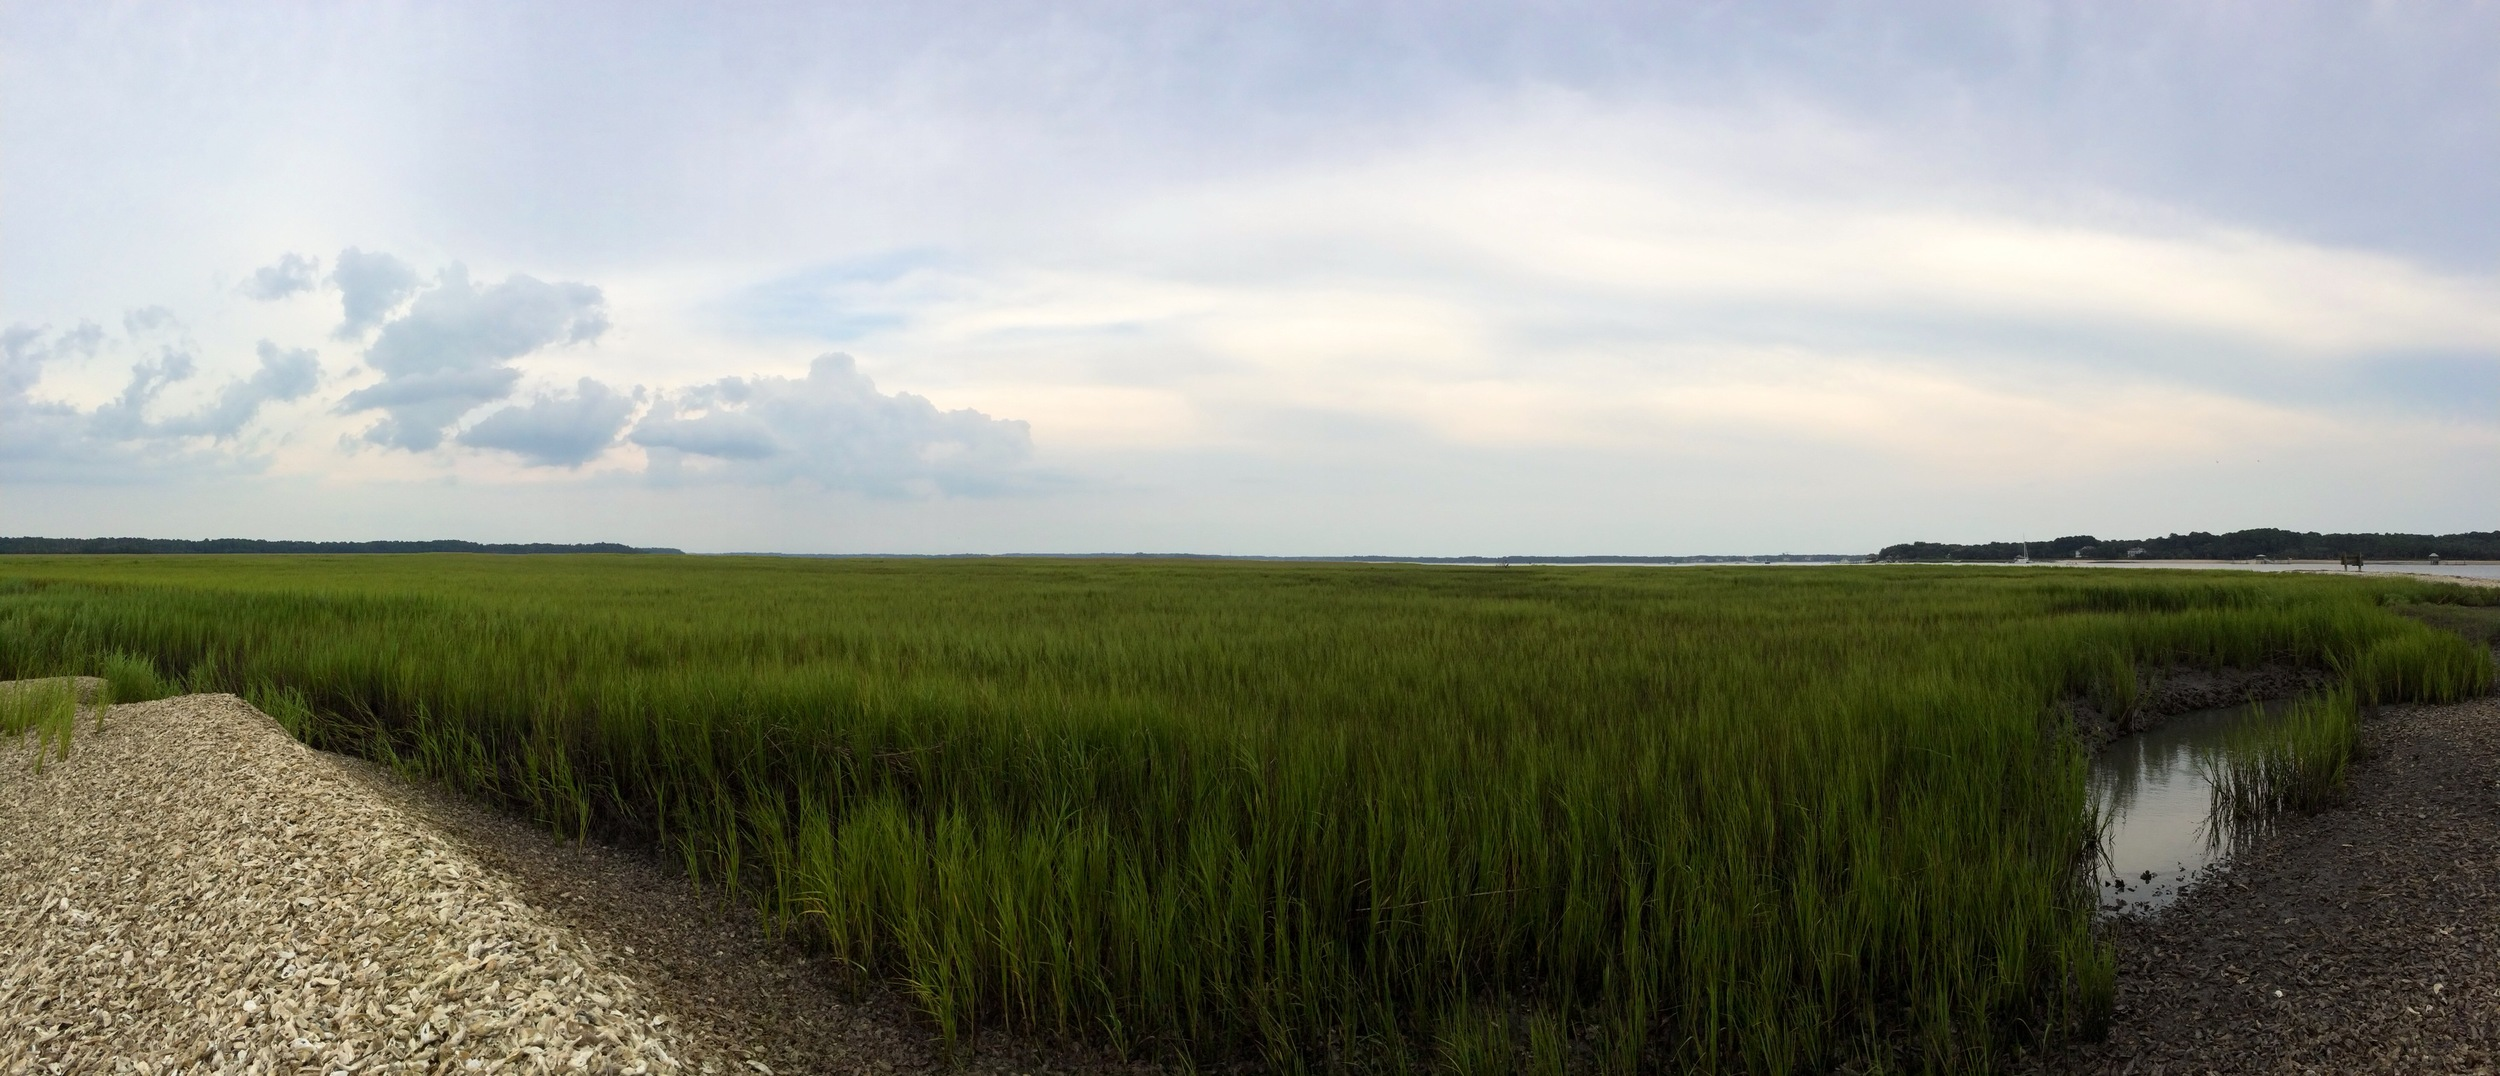 Tidal creek; South Carolina coast near Bluffton, SC